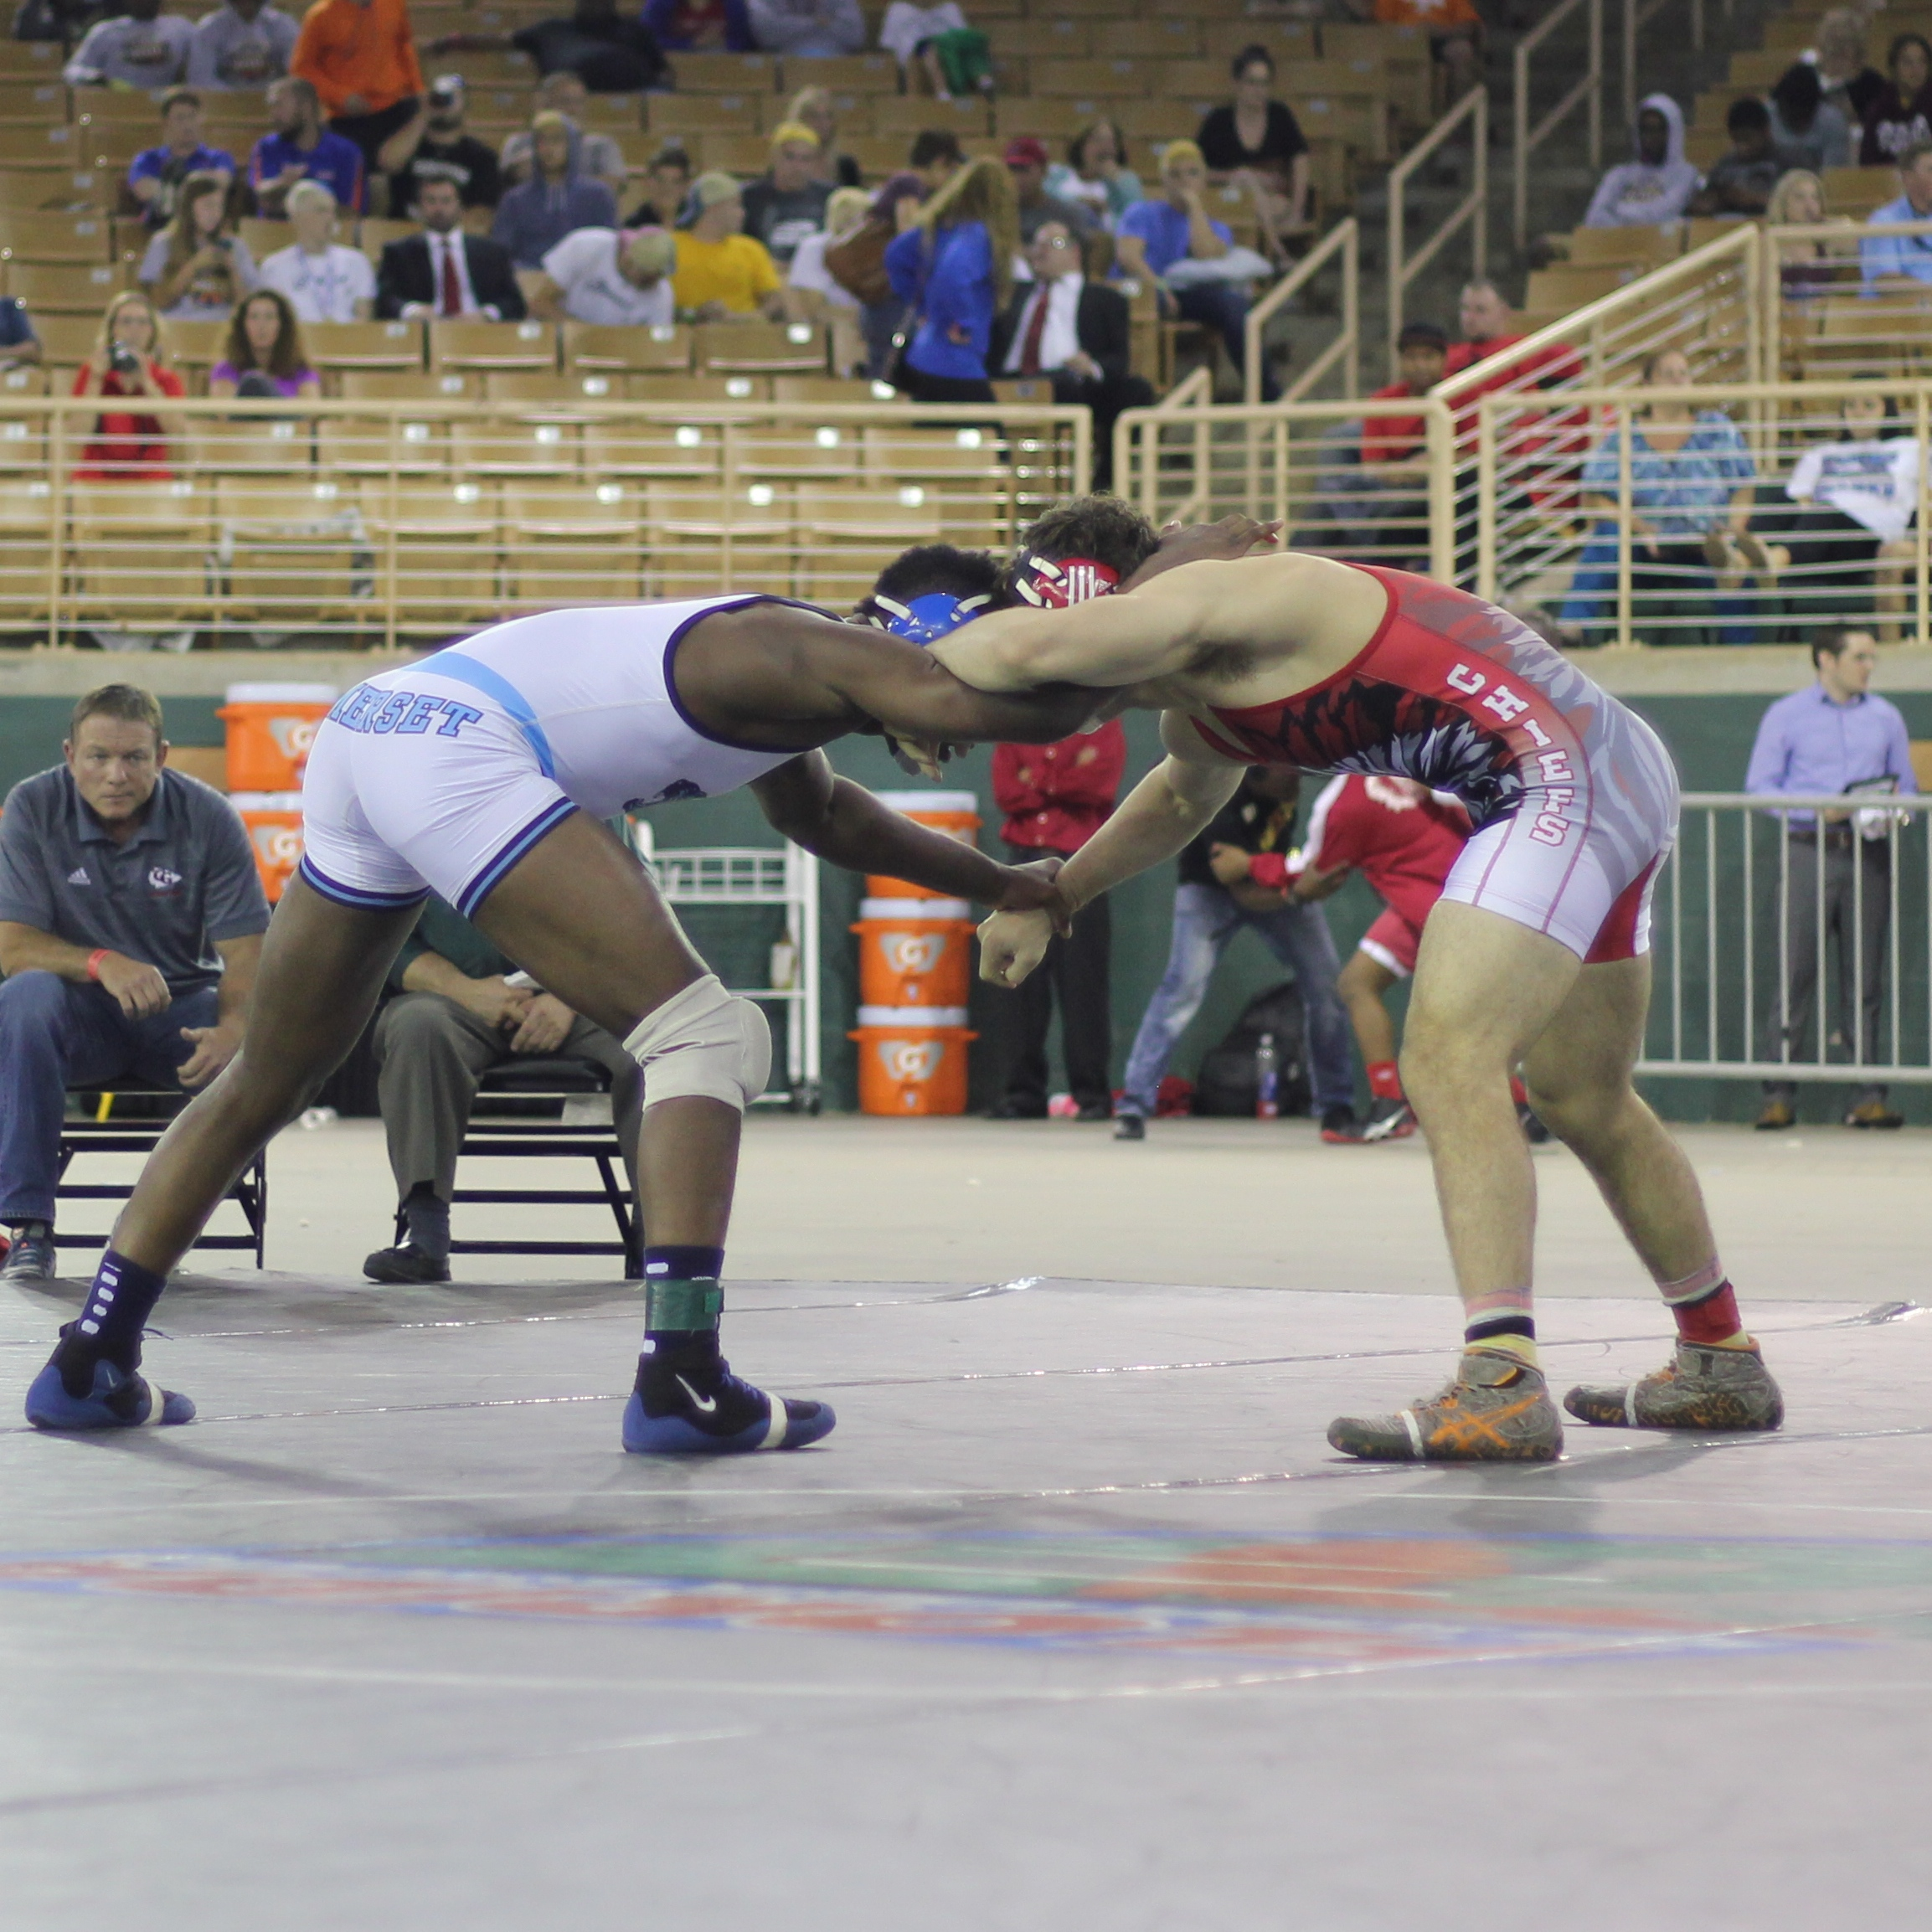 Reggler beat Sannasardo 5-3 ot to win the 2015 1A 182 lb. title